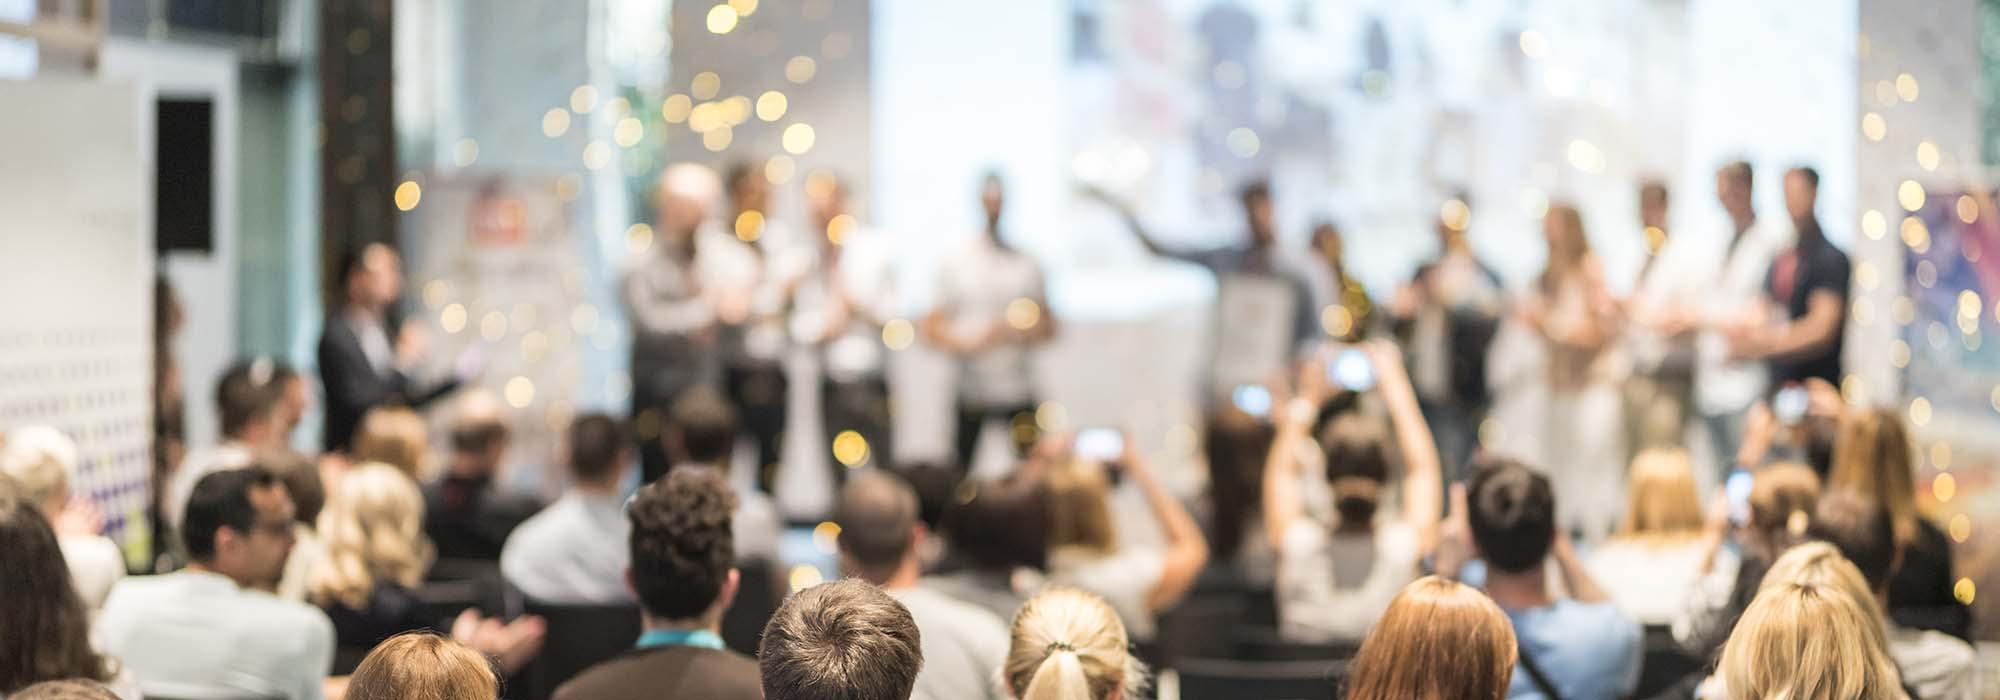 Eventmarketing | Werbeagentur Siekmann